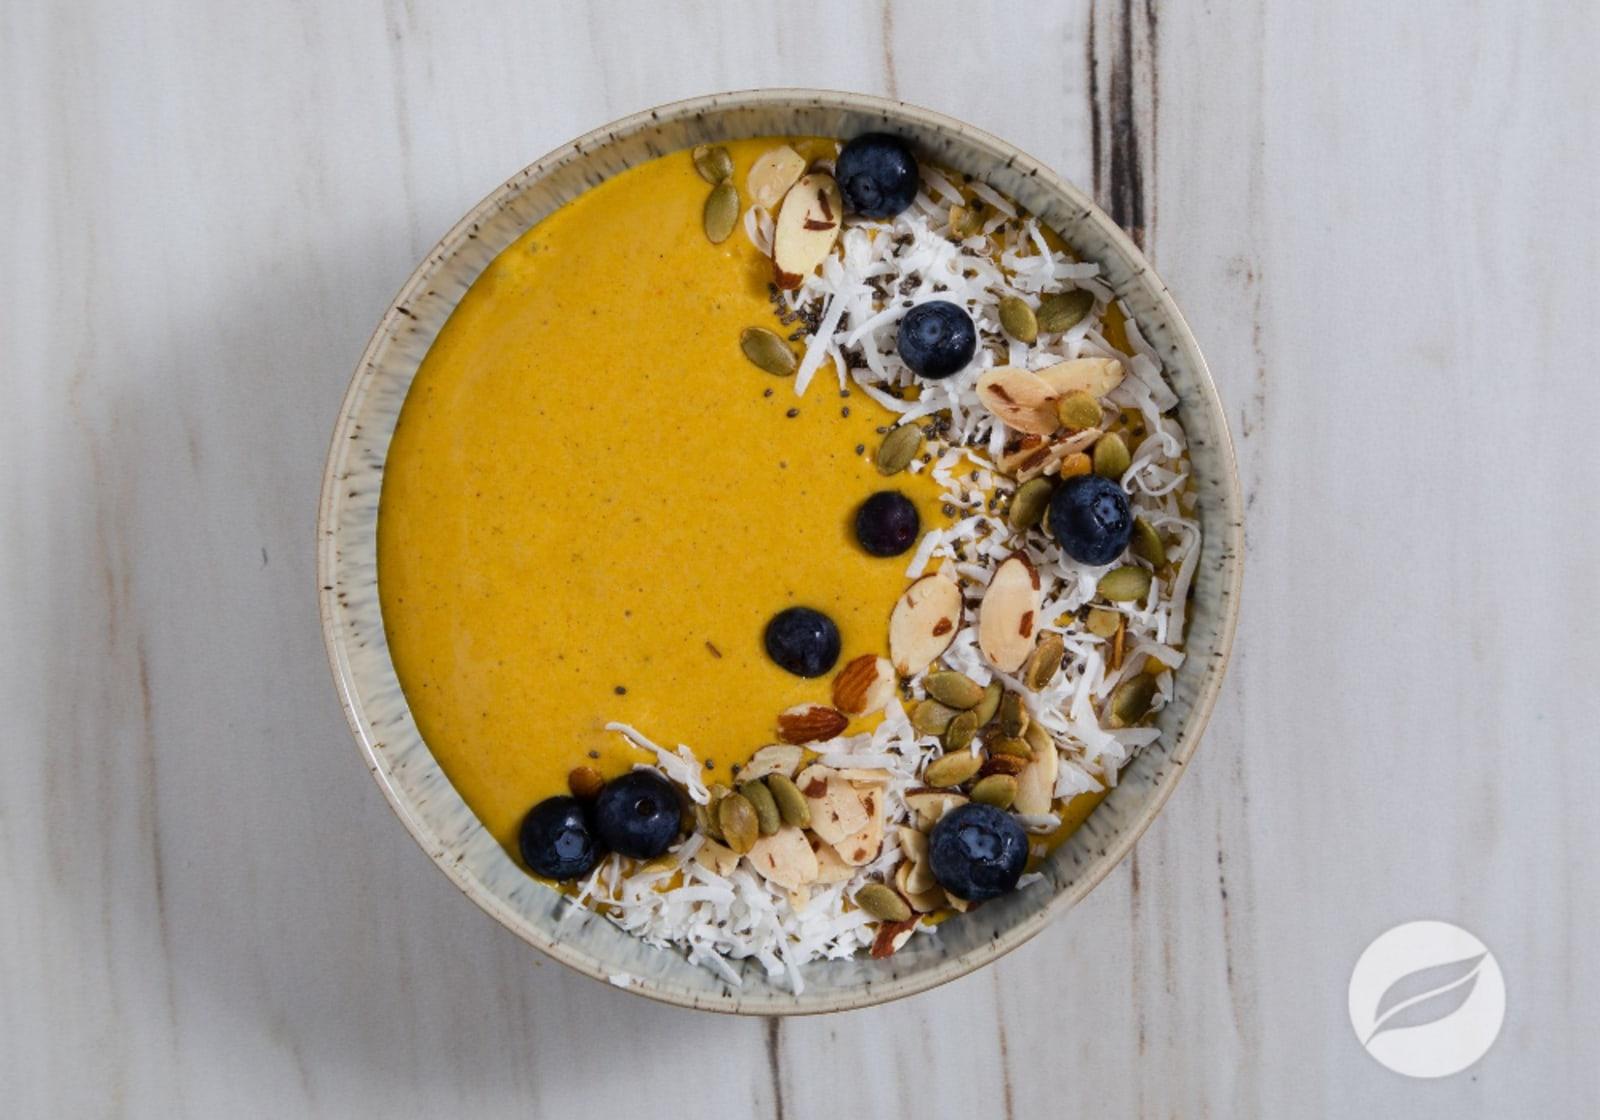 Image of Golden Milk Smoothie Bowl